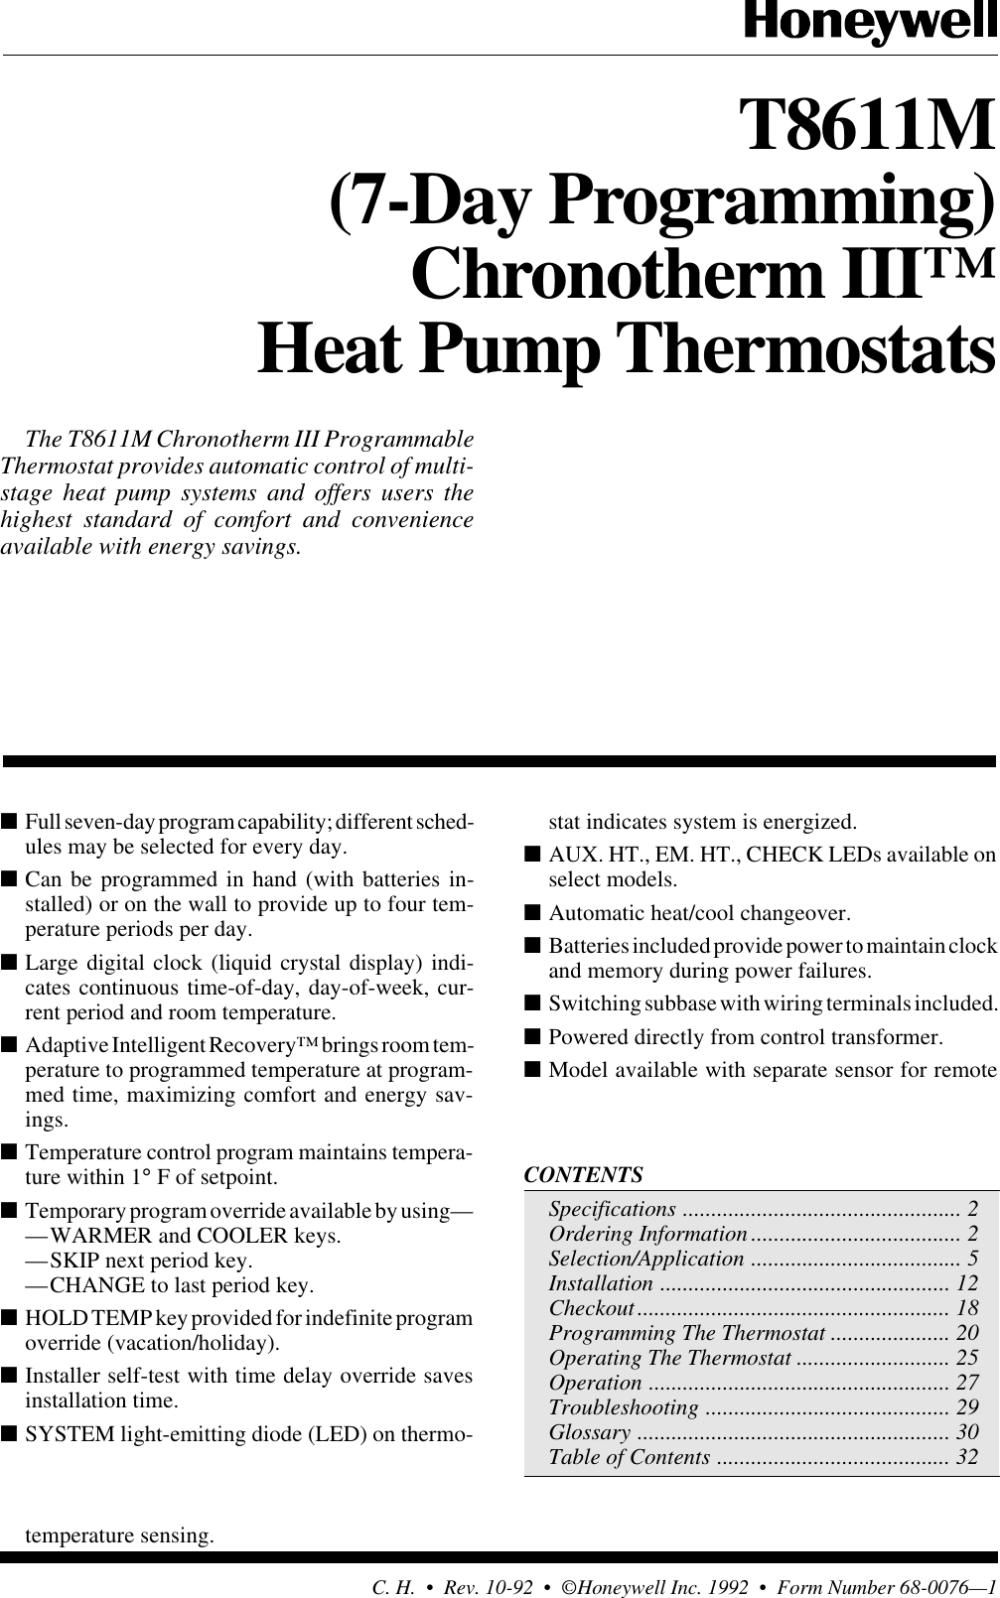 medium resolution of honeywell chronotherm iii t8611m users manual 68 0076 7 day programming lll heat pump thermostats